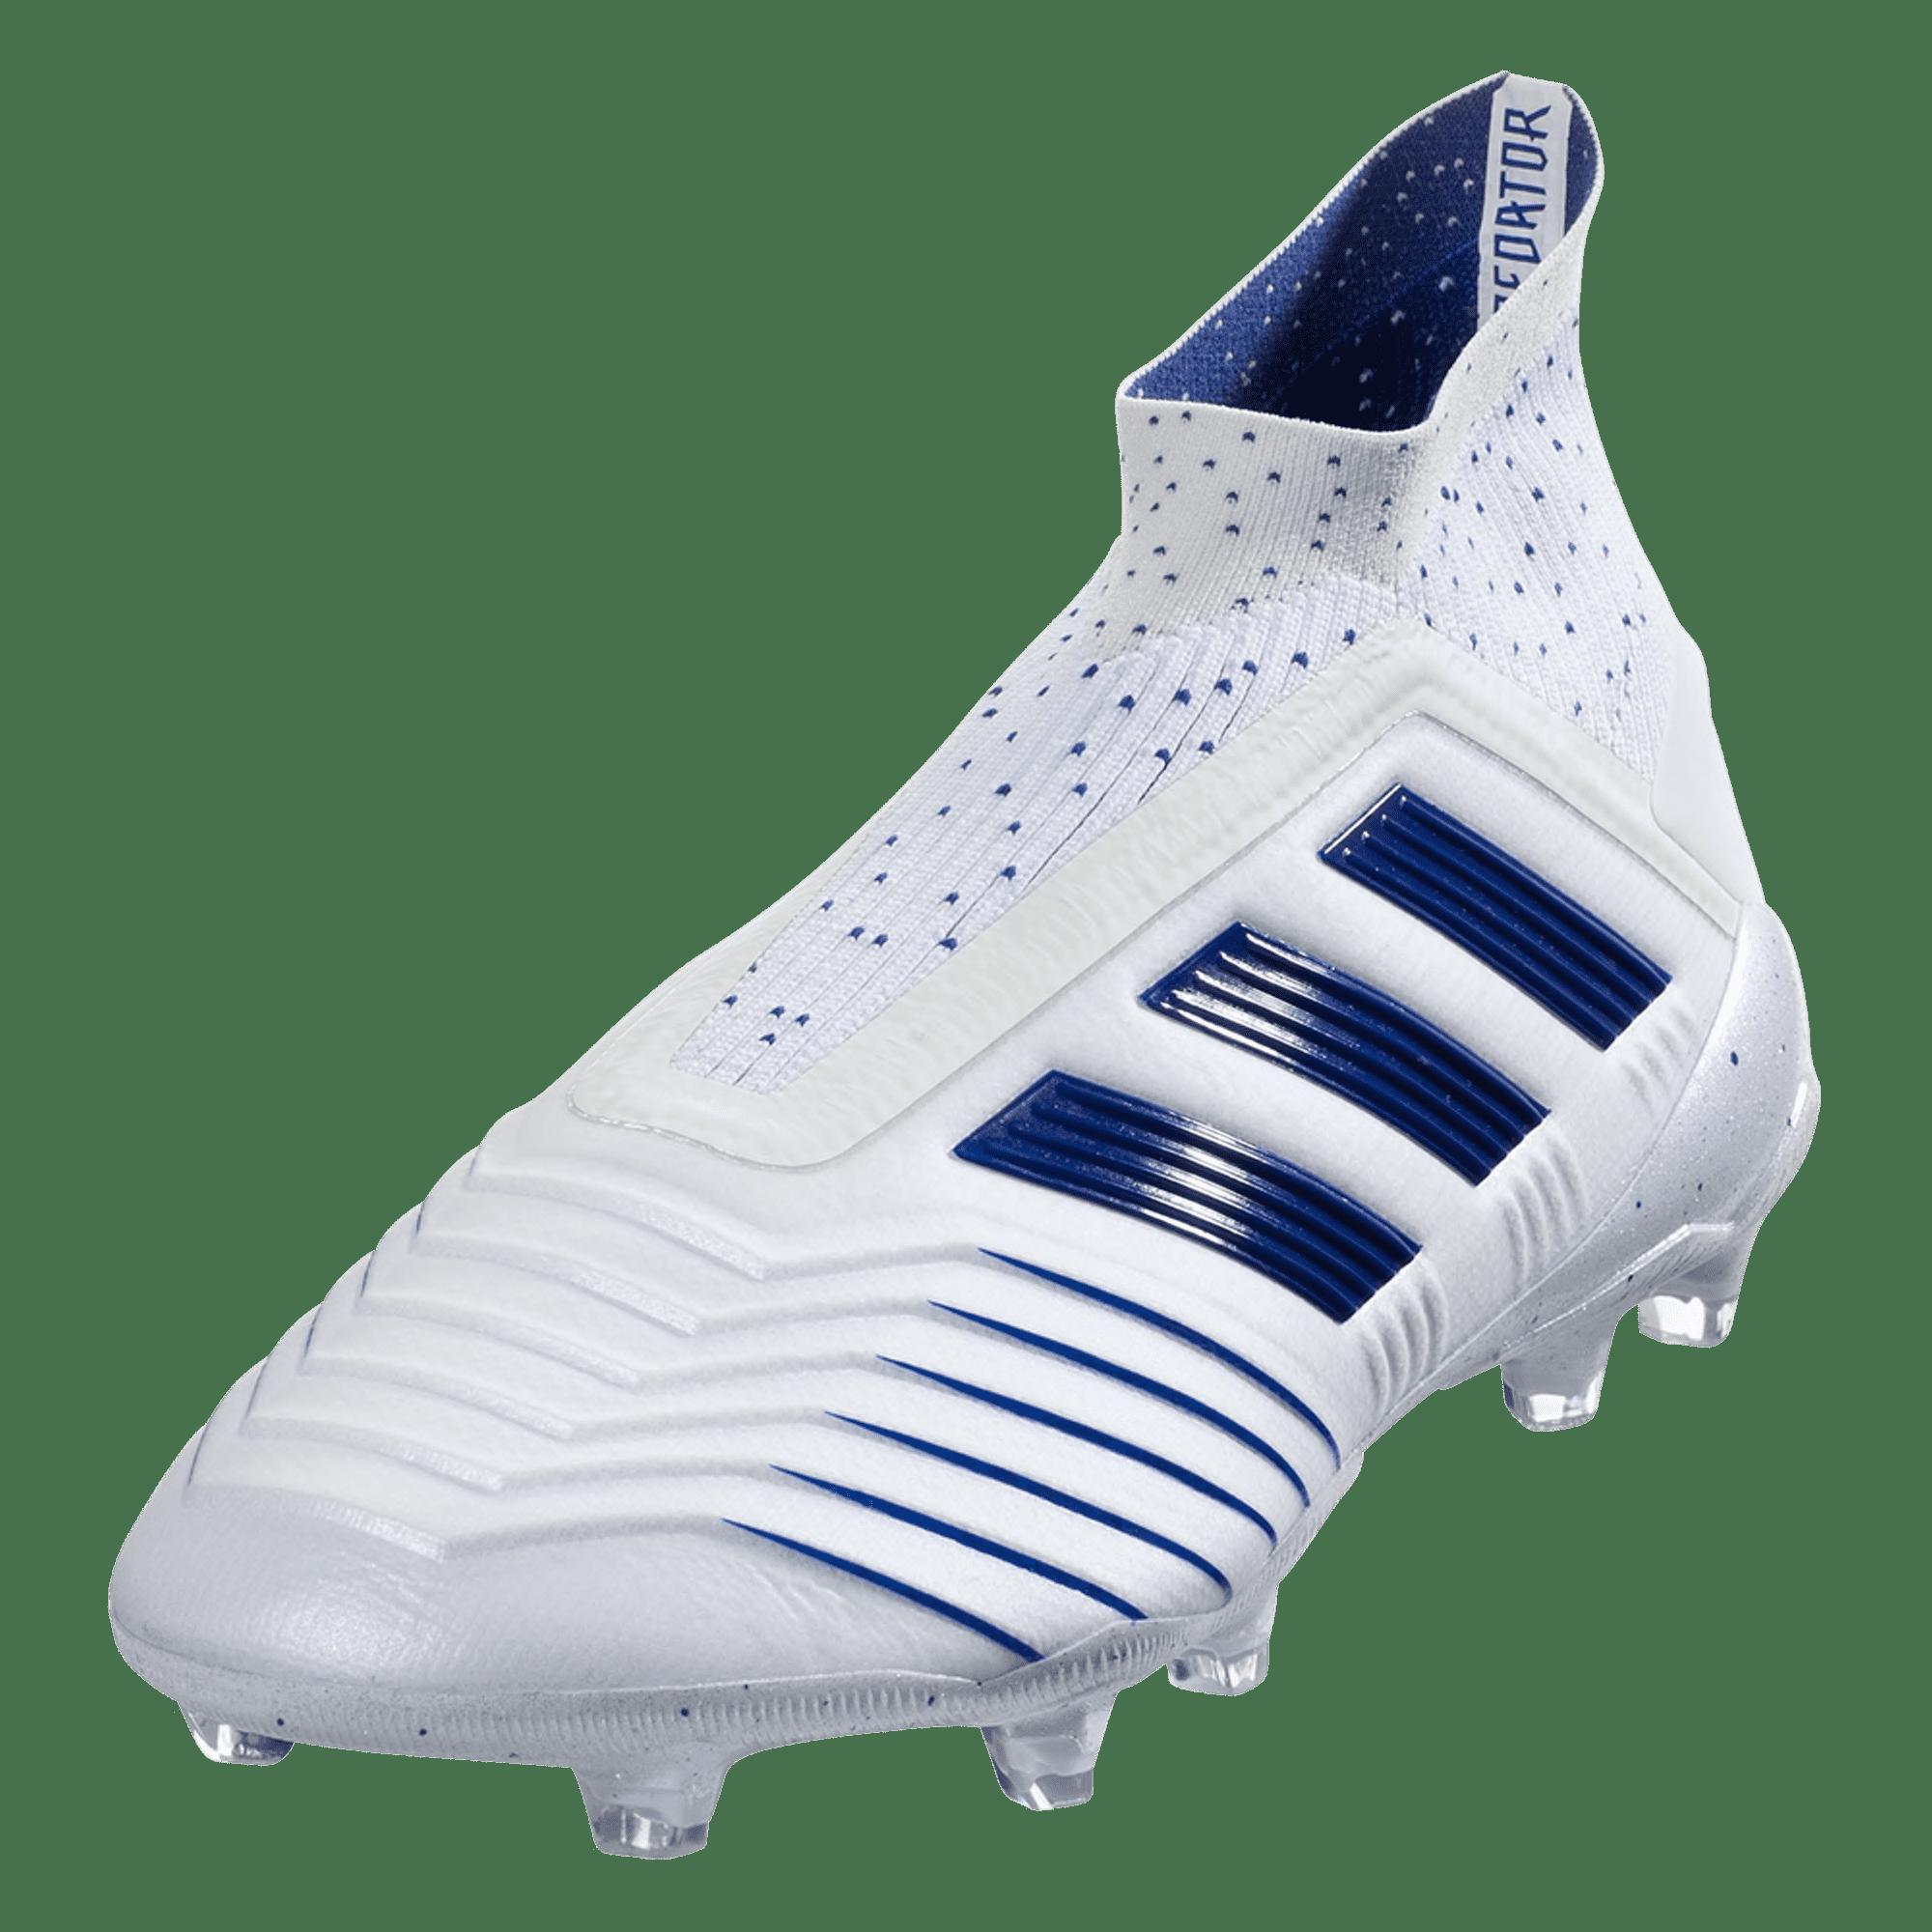 6c071353cd3 adidas Predator 19+ FG Firm Ground Soccer Cleat – White Blue ...